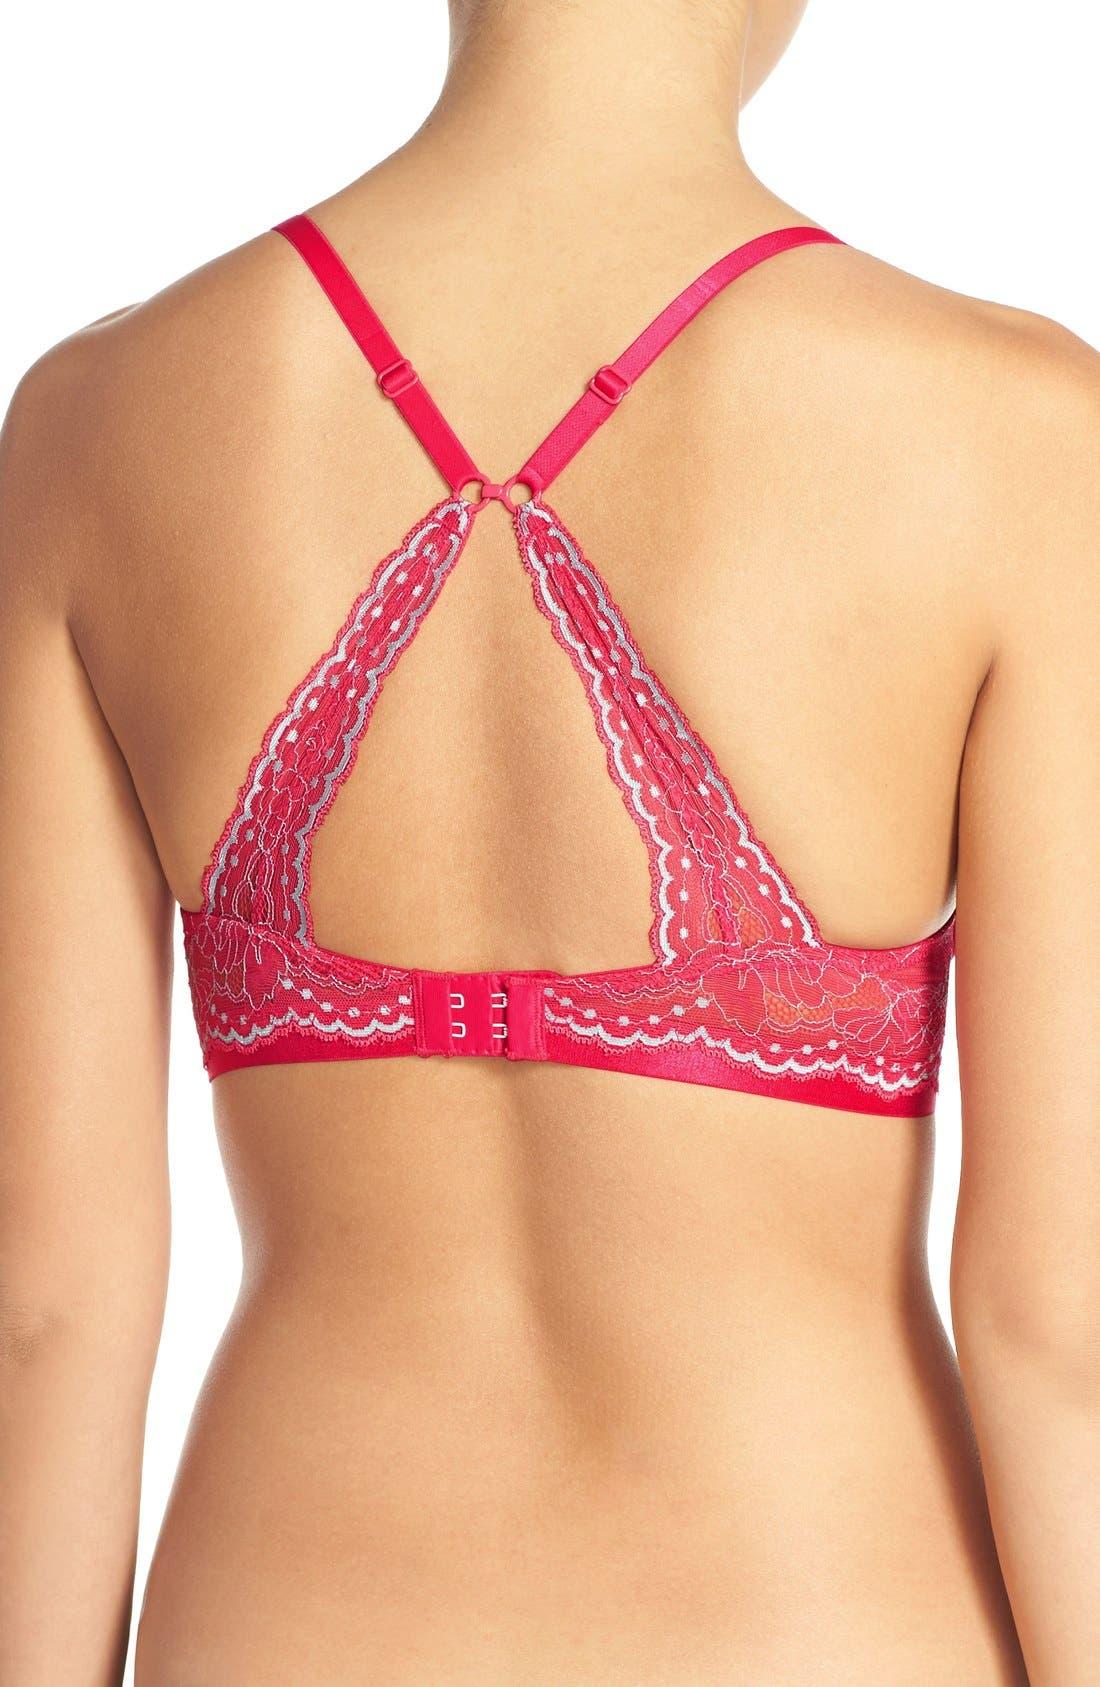 'Beautifully Basic' Lace Trim Underwire Plunge Bra,                             Alternate thumbnail 40, color,